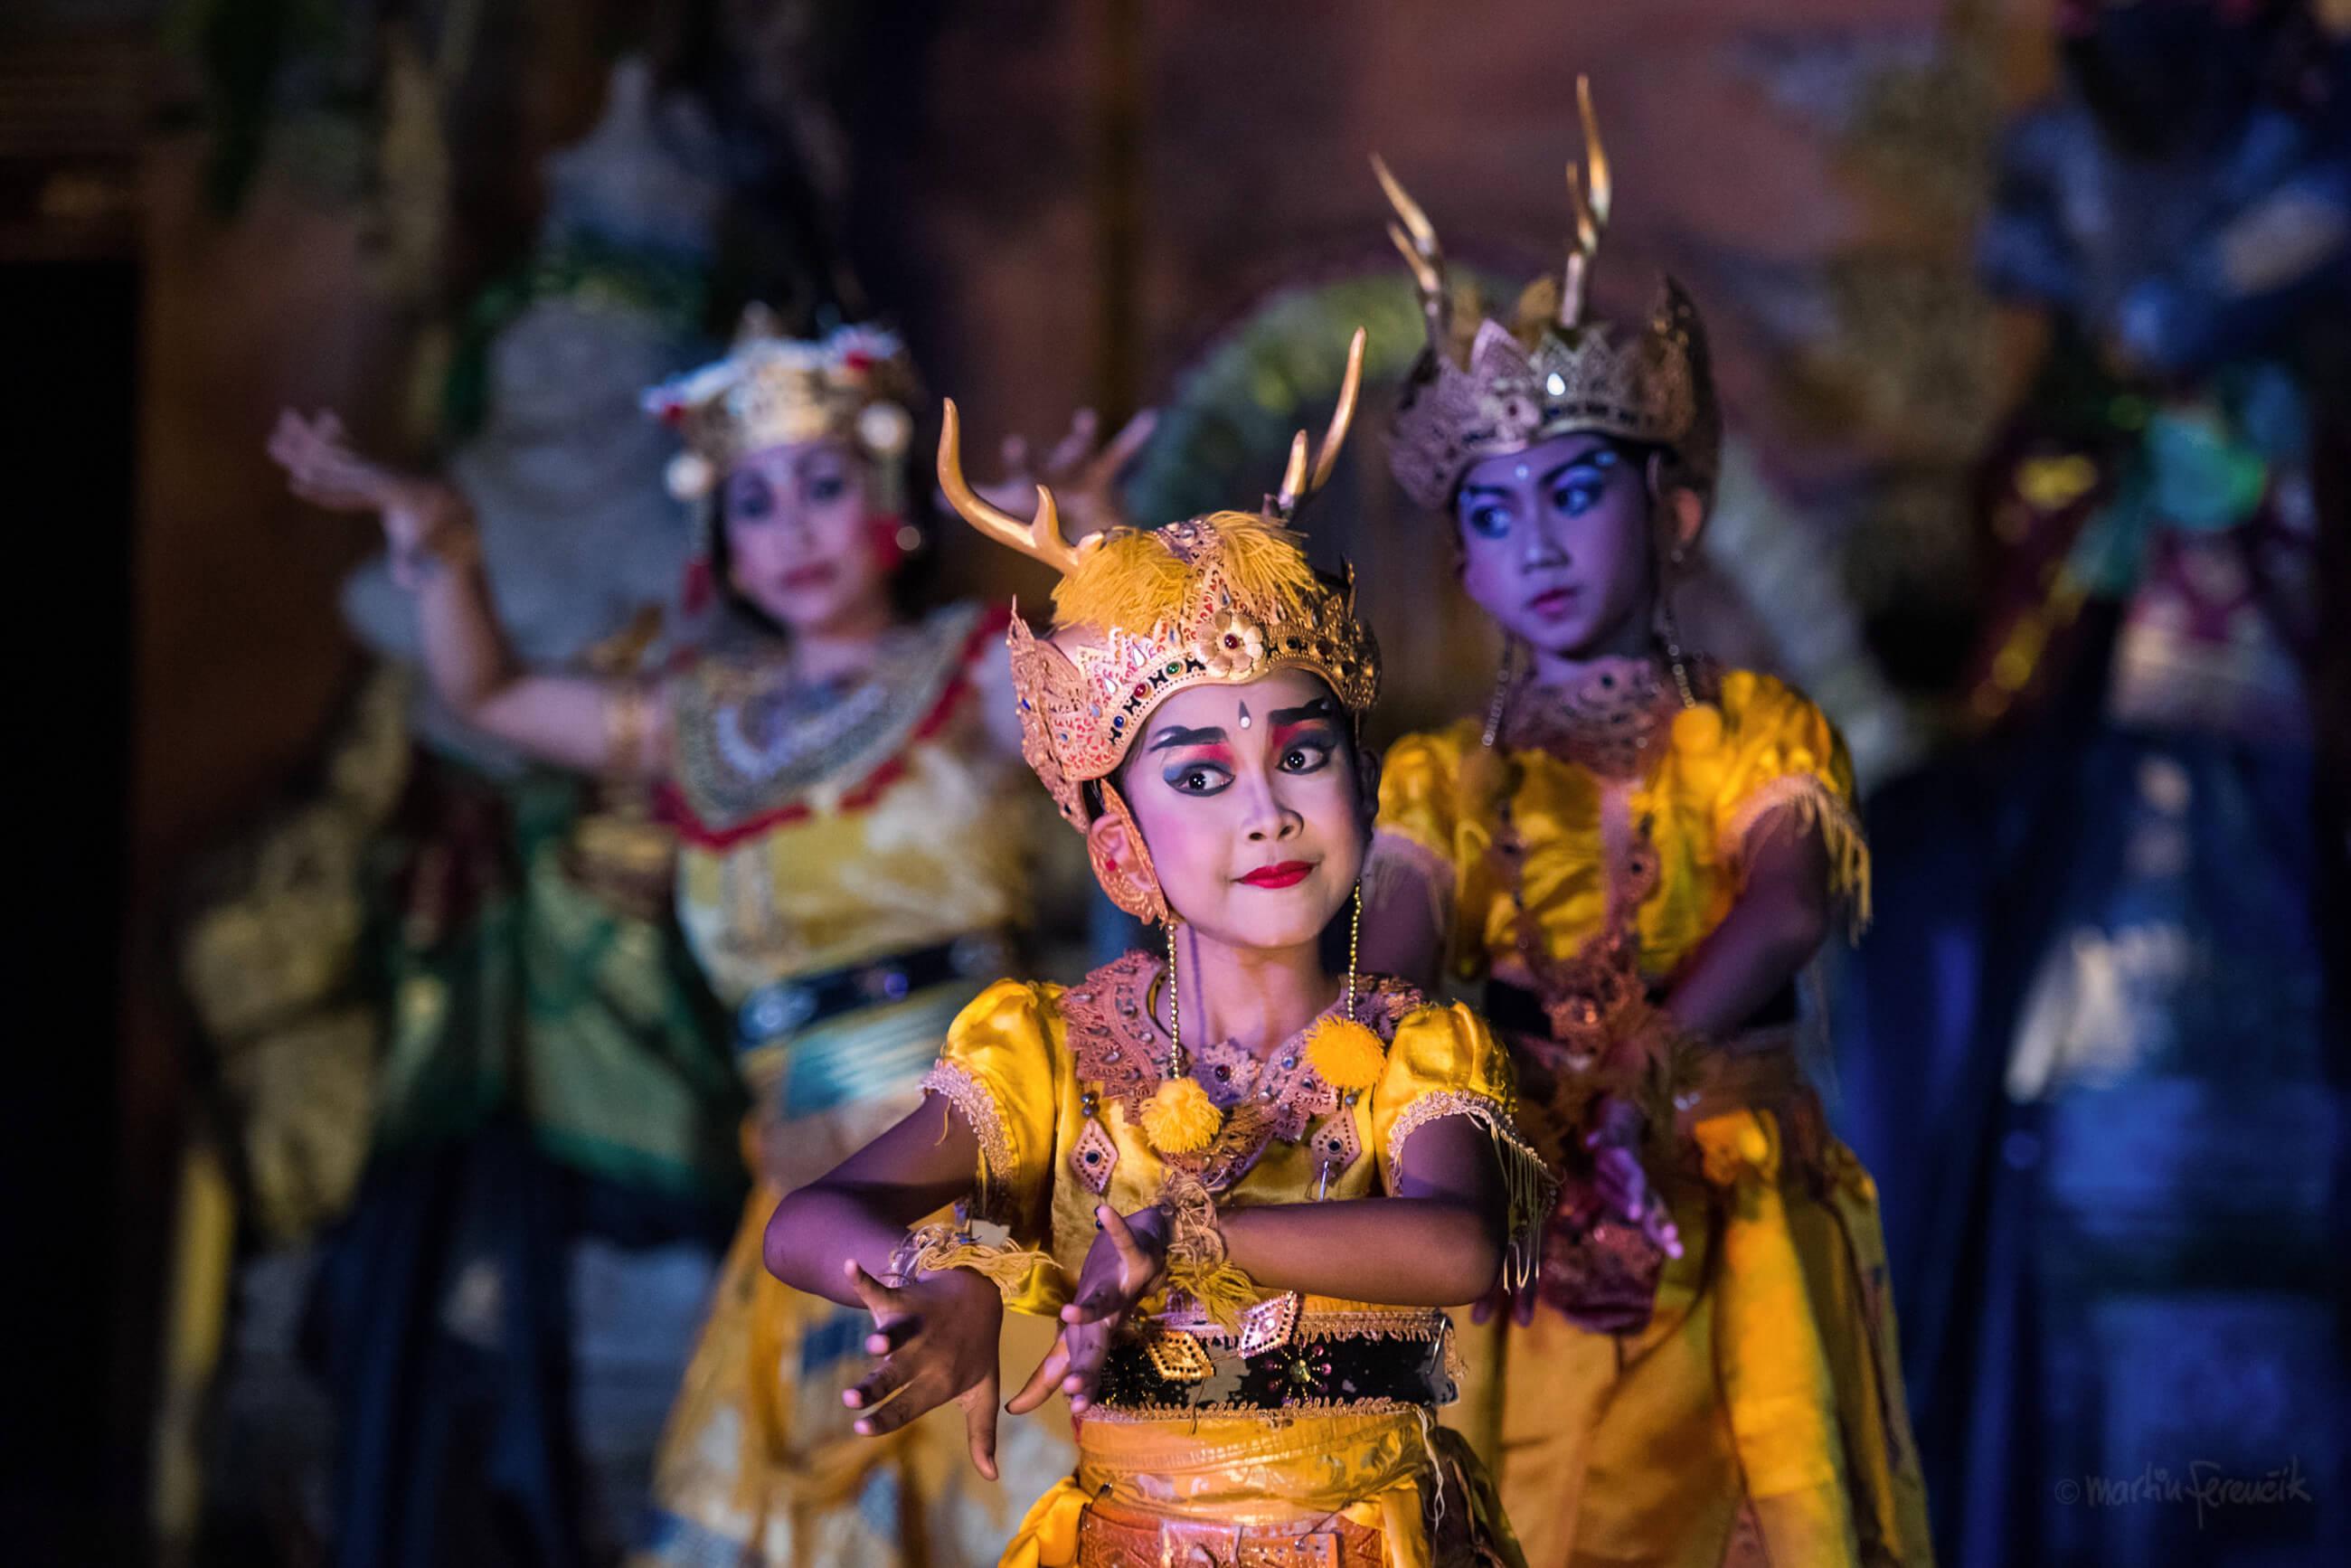 https://bubo.sk/uploads/galleries/4921/martinferencik_indonezia_bali_dsc9444-2.jpg